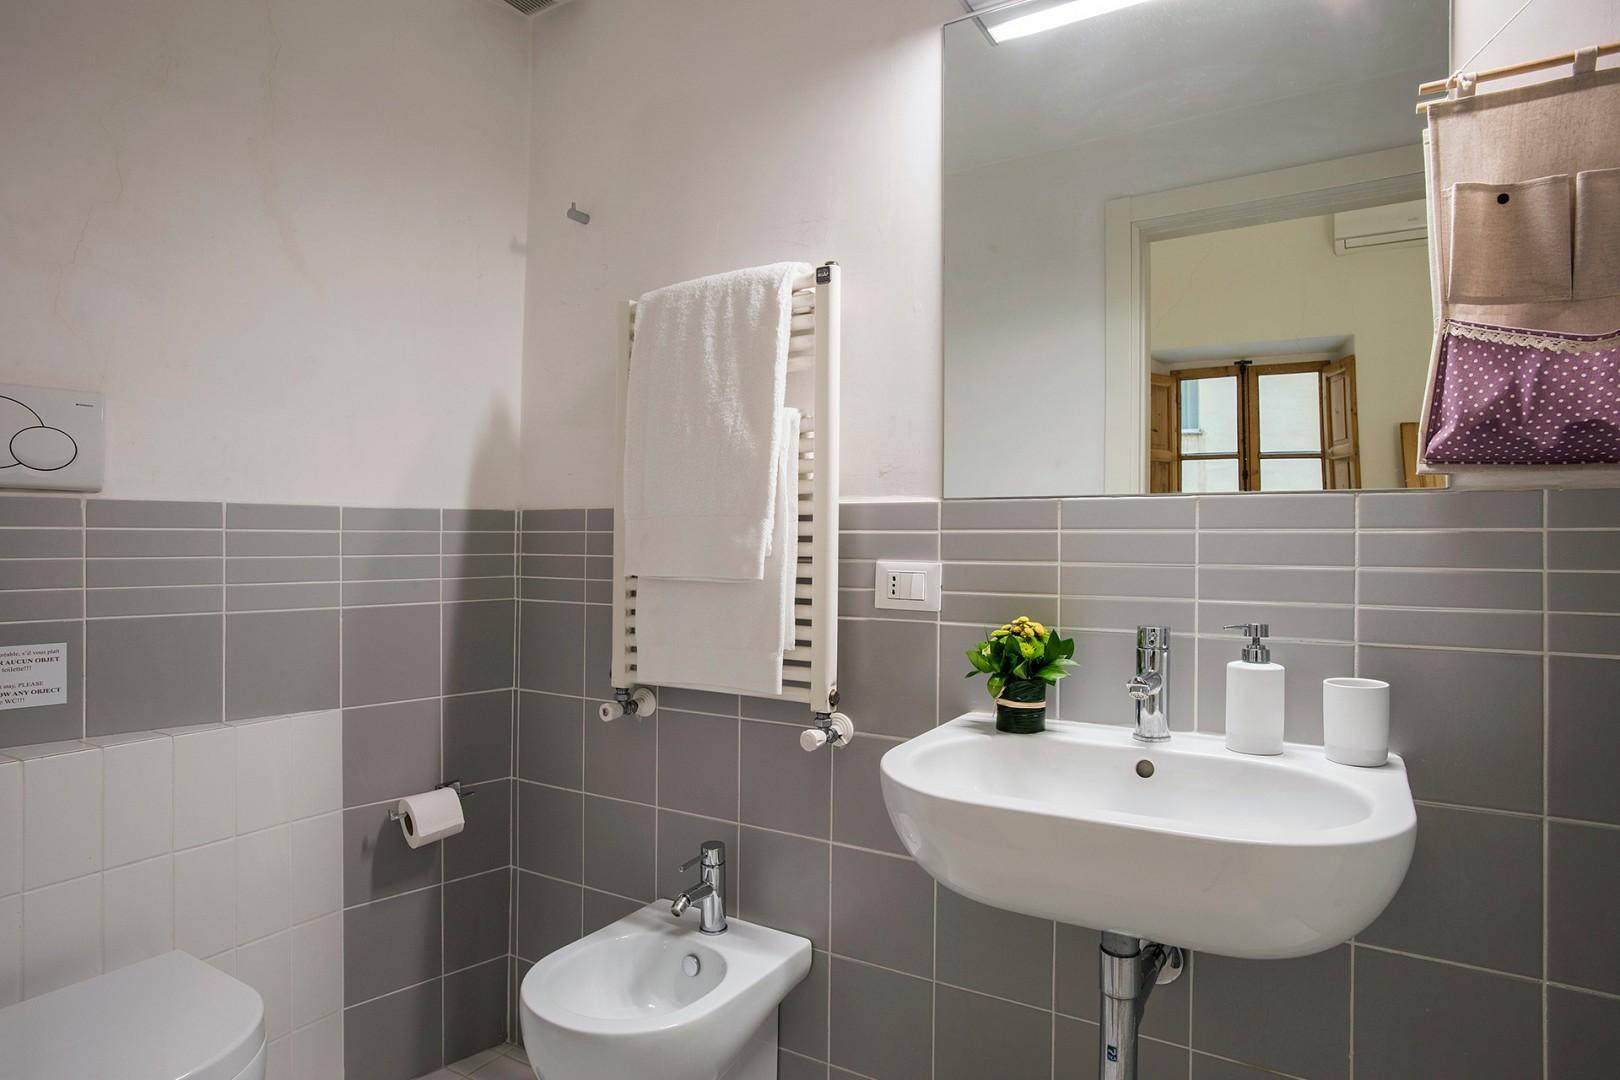 Bathroom 1 is en suite to bedroom 1 with shower, sink, toilet, and bidet.